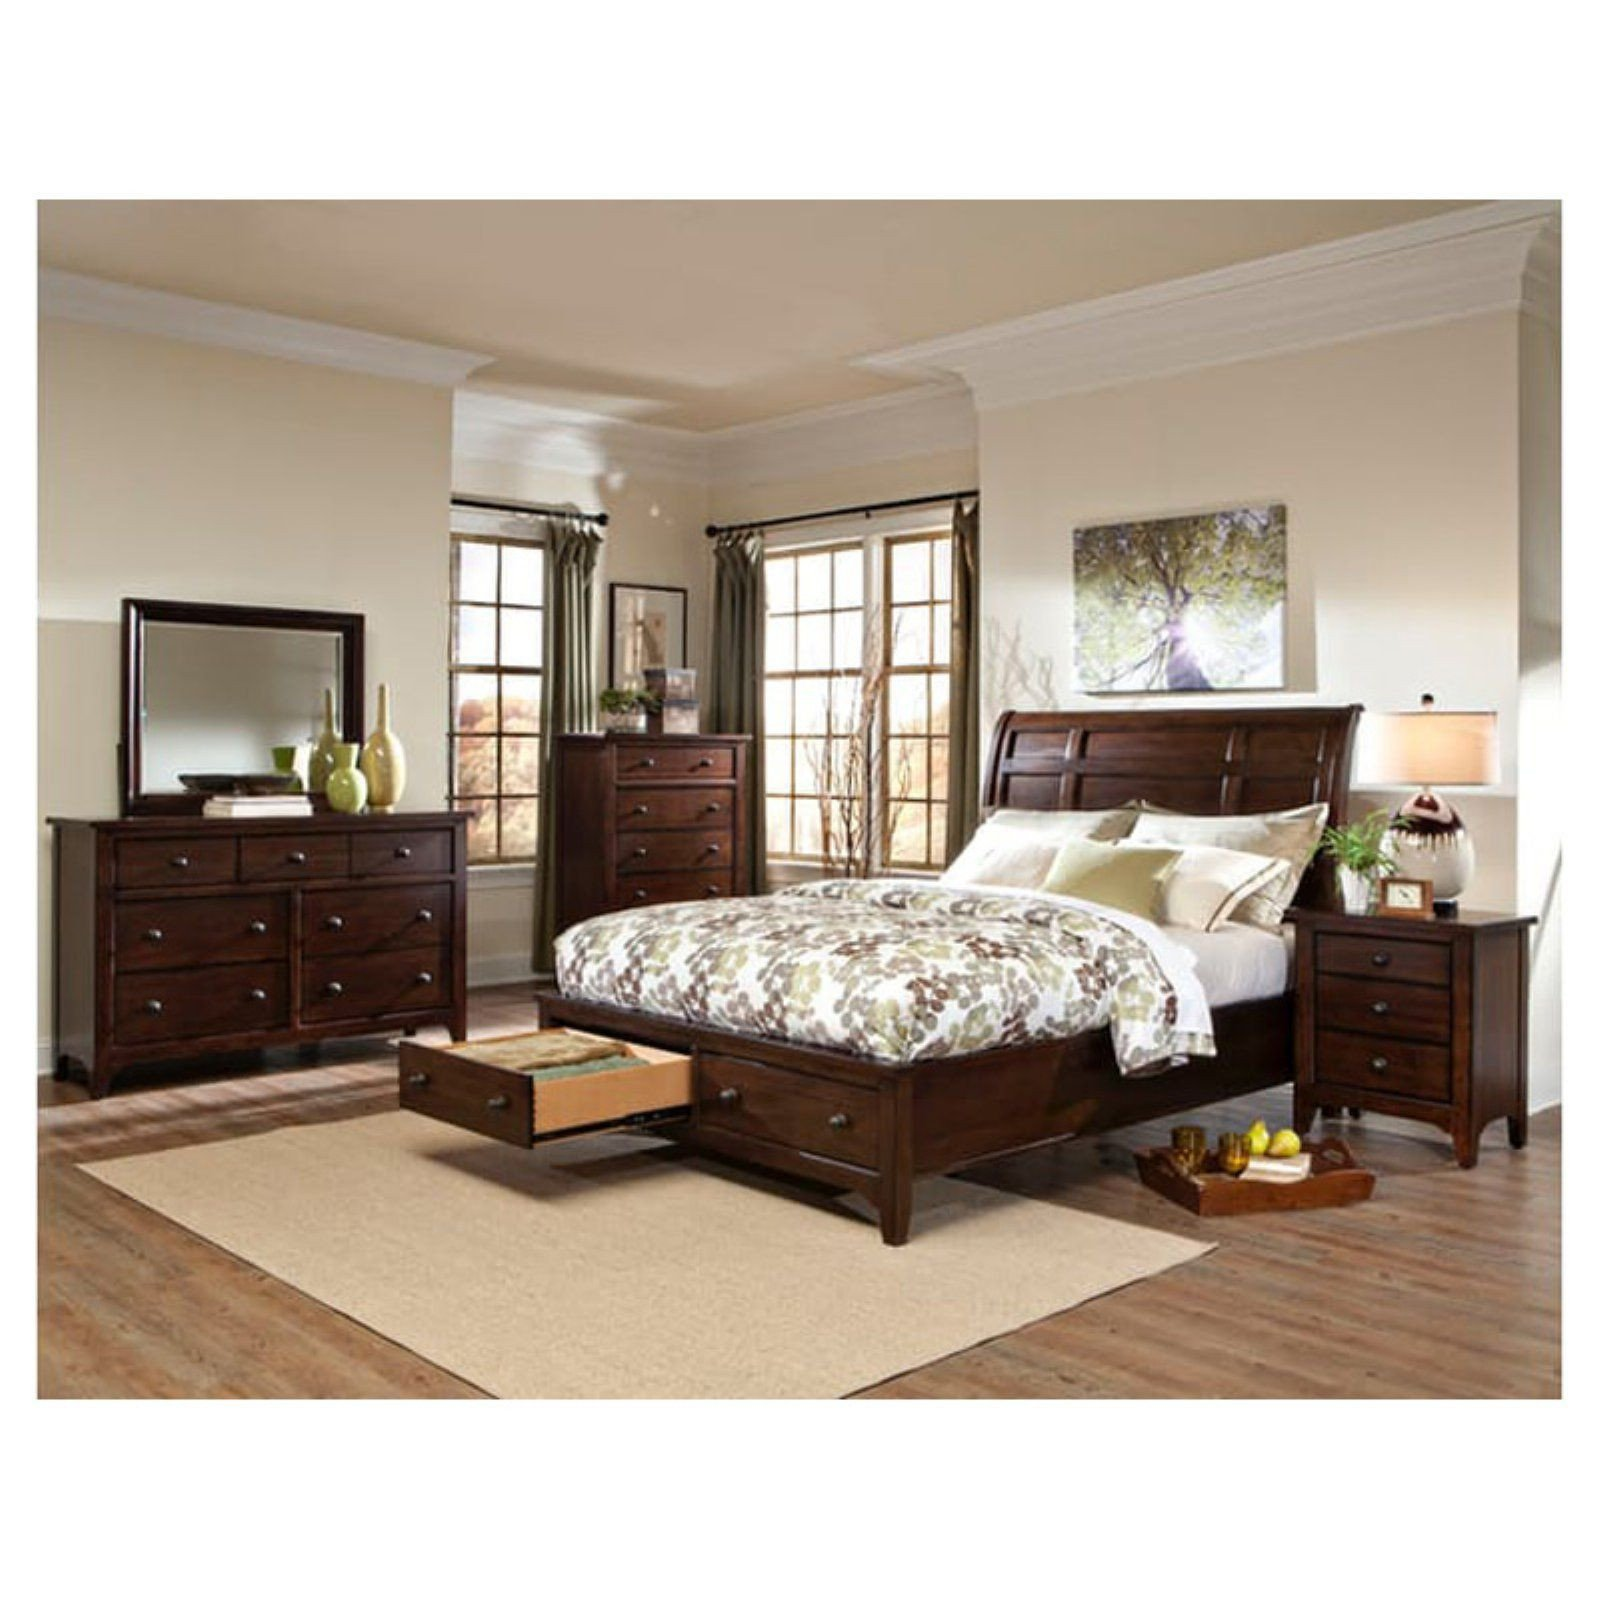 California King Bedroom Set Fresh Imagio Home Jackson Sleigh Storage Bed Size California